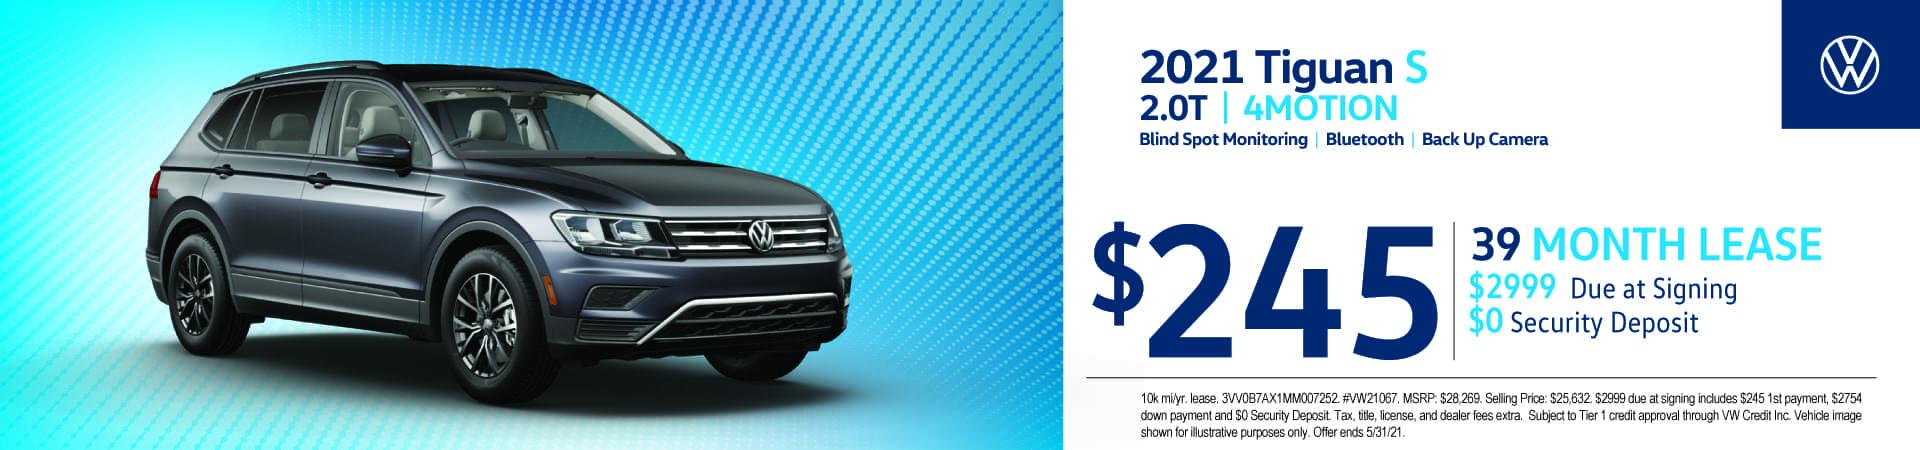 May-2021-VW-CS-Slides_2021-Tiguan-S